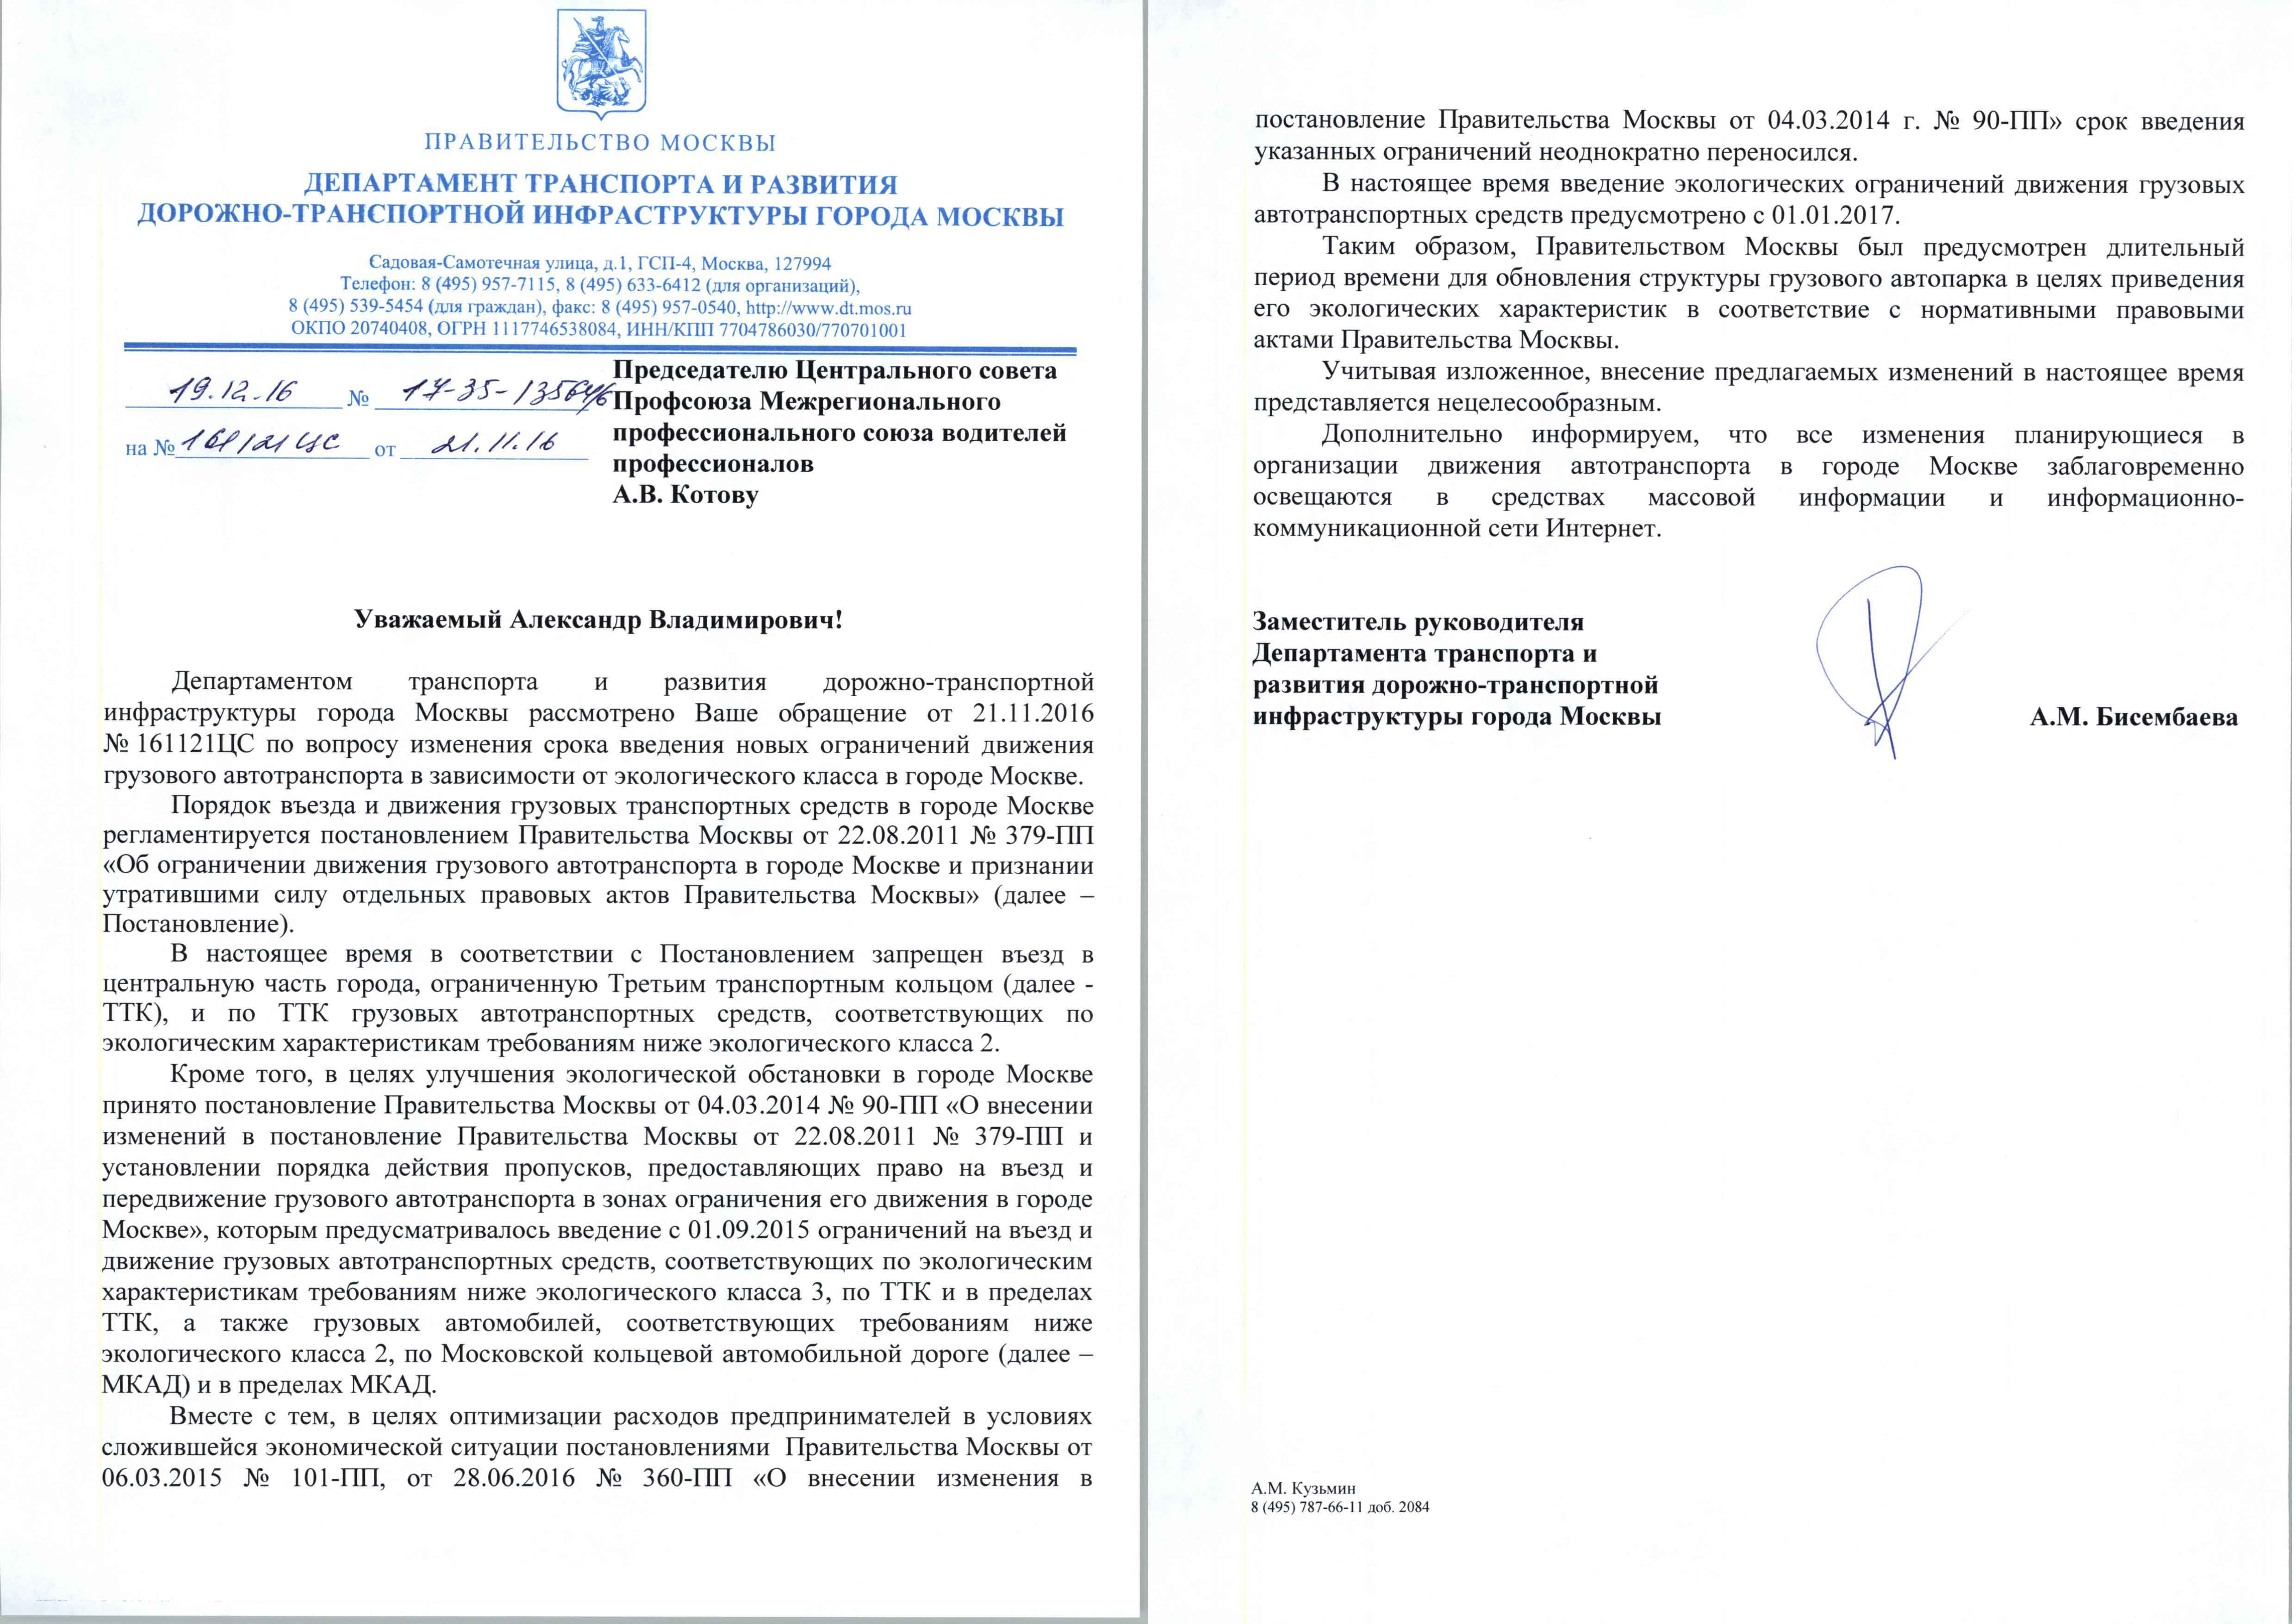 19.12.2016_17-35-13564_6_Бисембаева_А.М.jpg